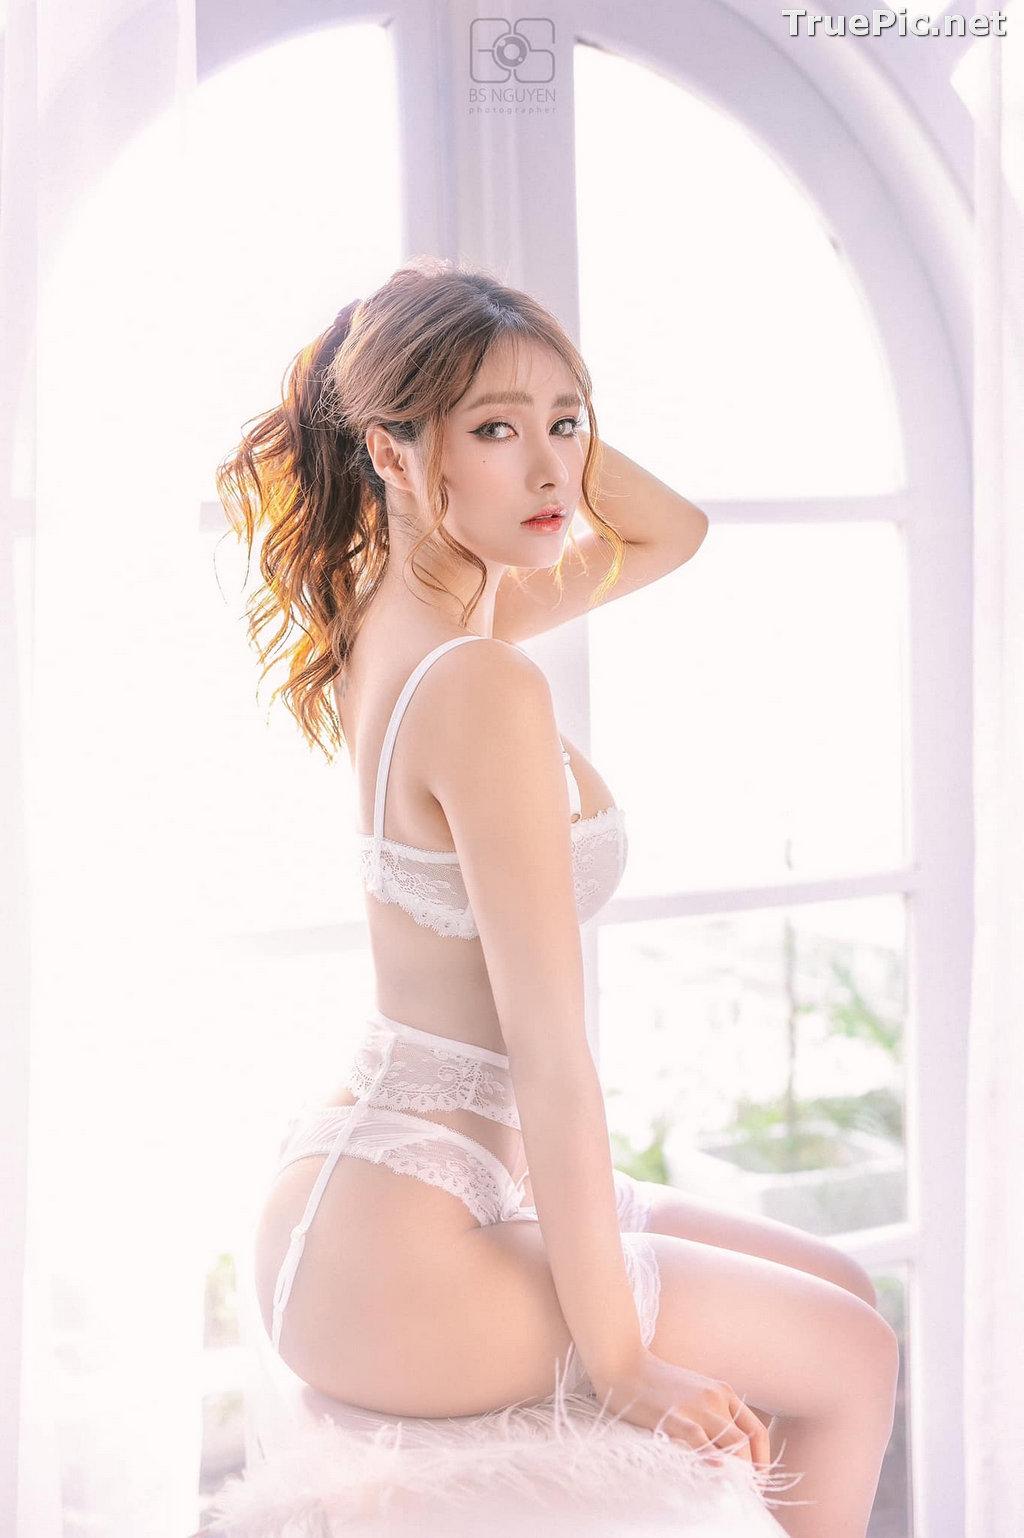 Image Vietnamese Model - Nguyen Thi Phi Yen - Beautiful Sexy White Lingerie - TruePic.net - Picture-5